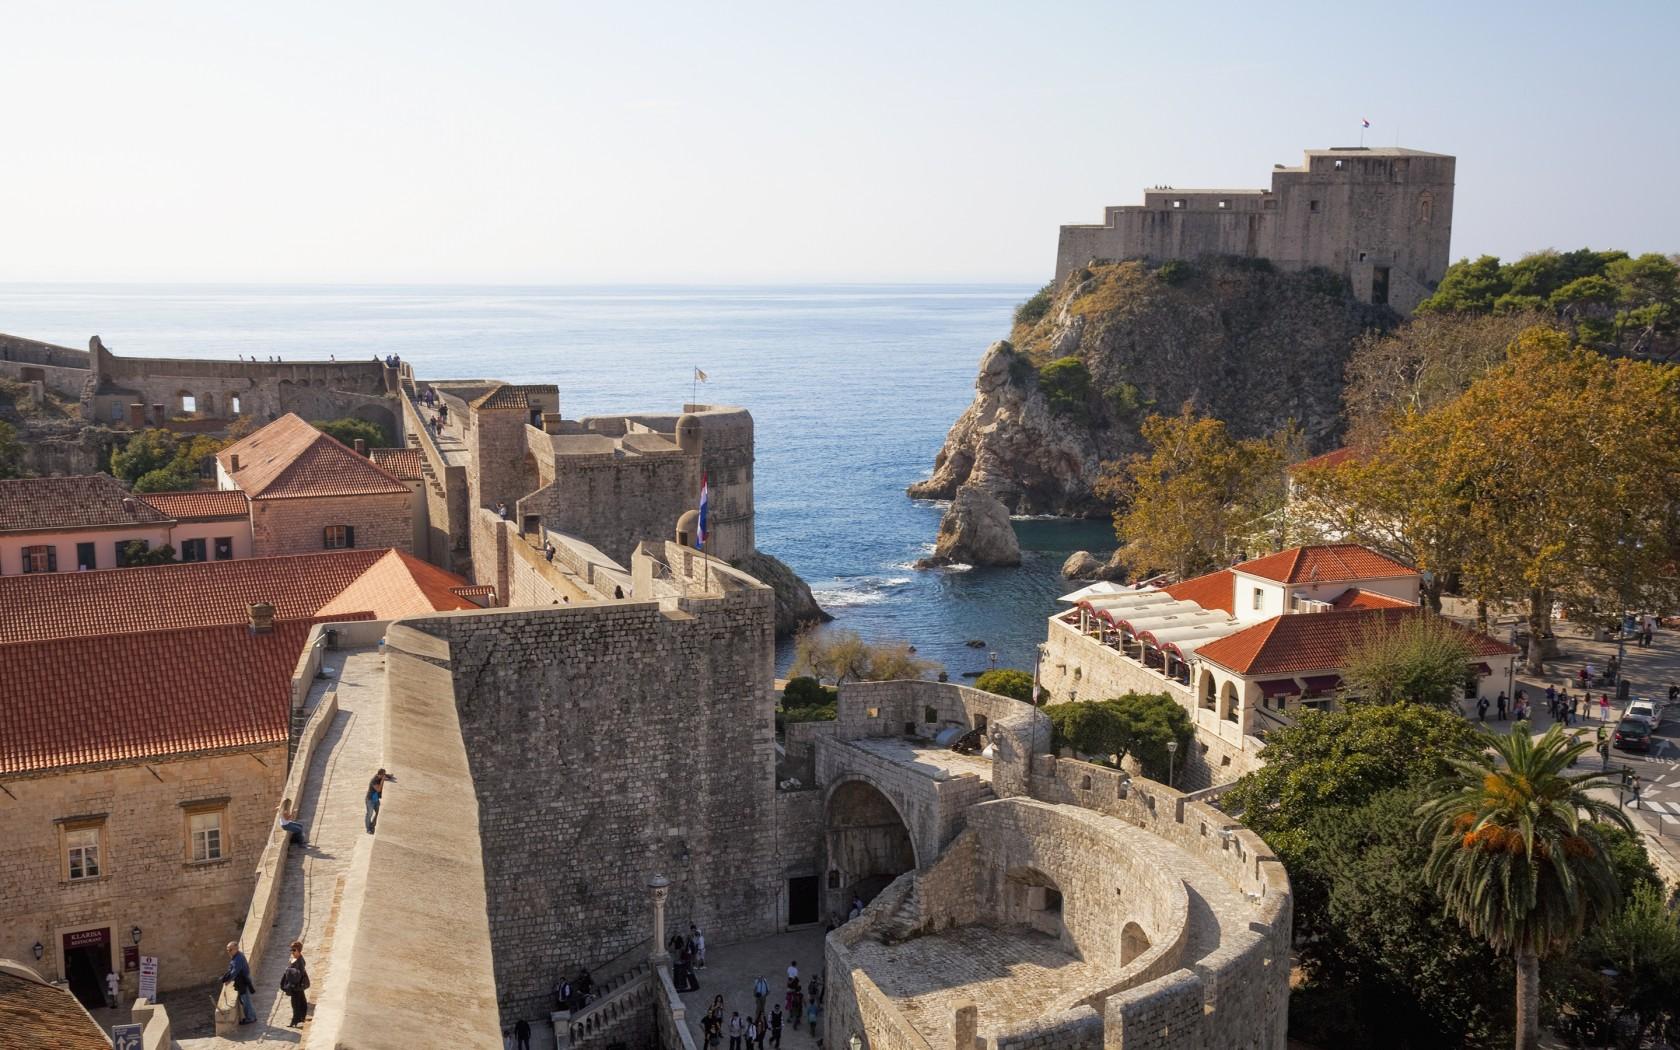 Game of Thrones Filming Location - Fort Lovrijenac, Croatia